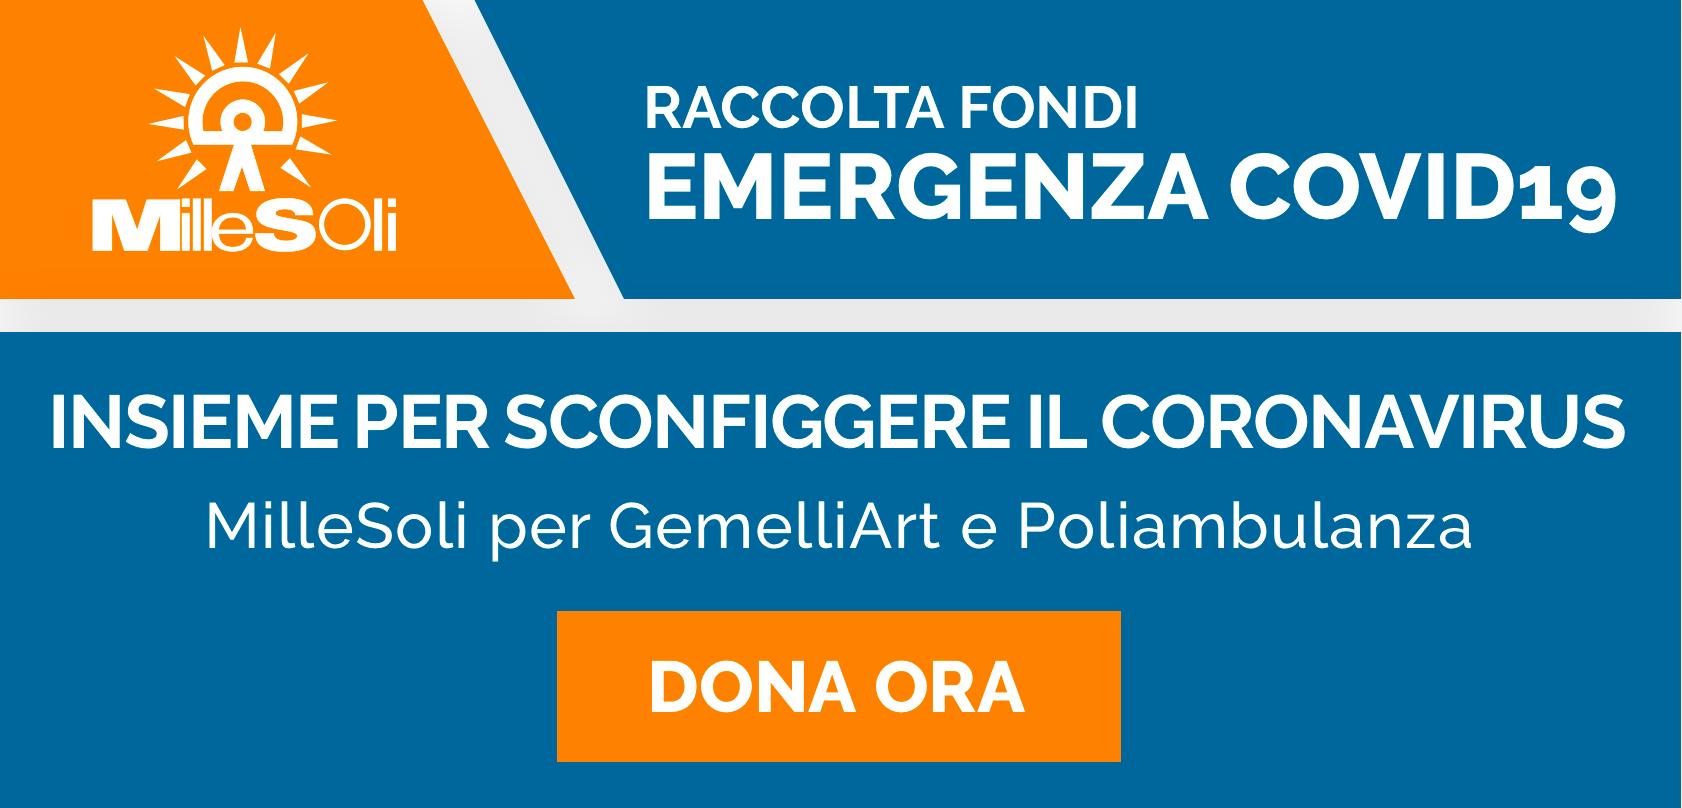 Raccolta Fondi Emergenza COVID19 MilleSoli per GemelliArt e Poliambulanza